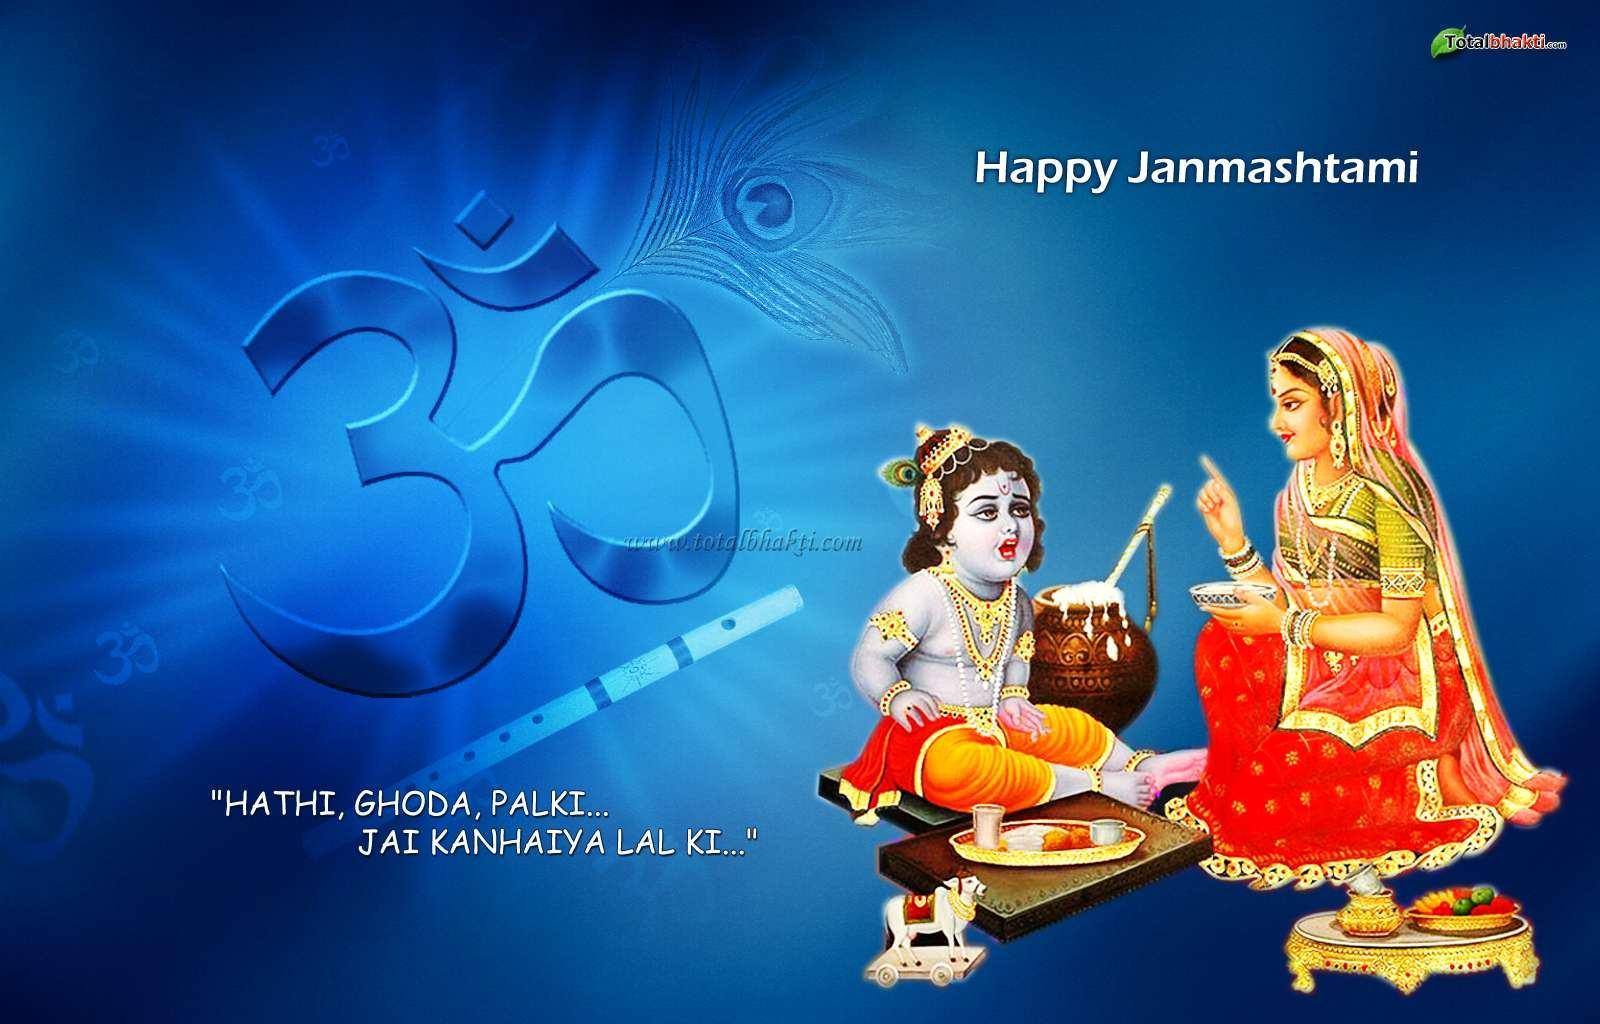 Krishna Janmashtami Greetings Cards & Ecards in Hindi